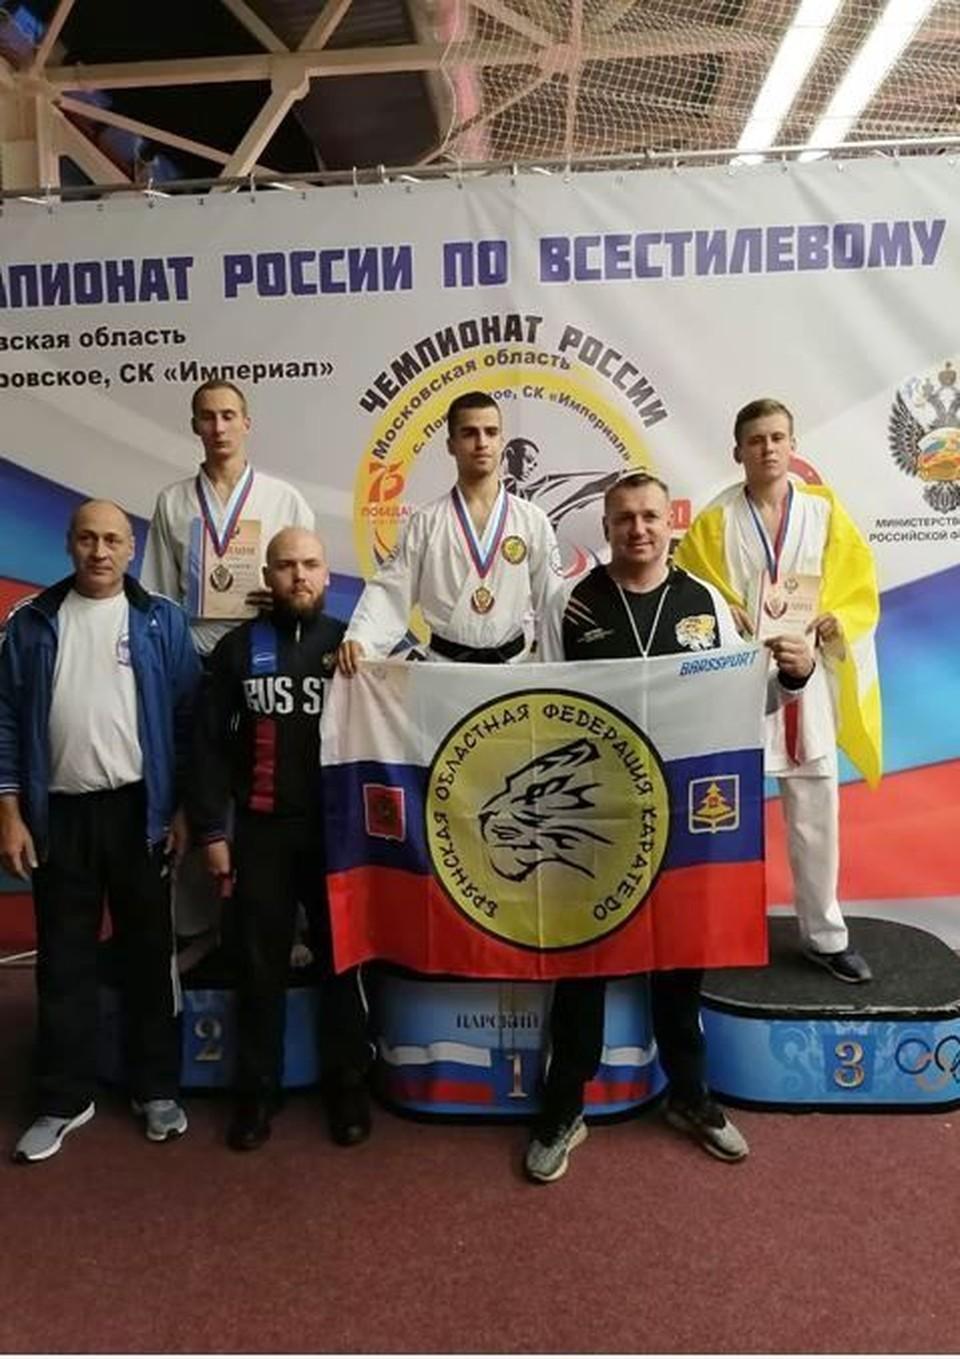 Фото: пресс-служба администрации Ставрополя